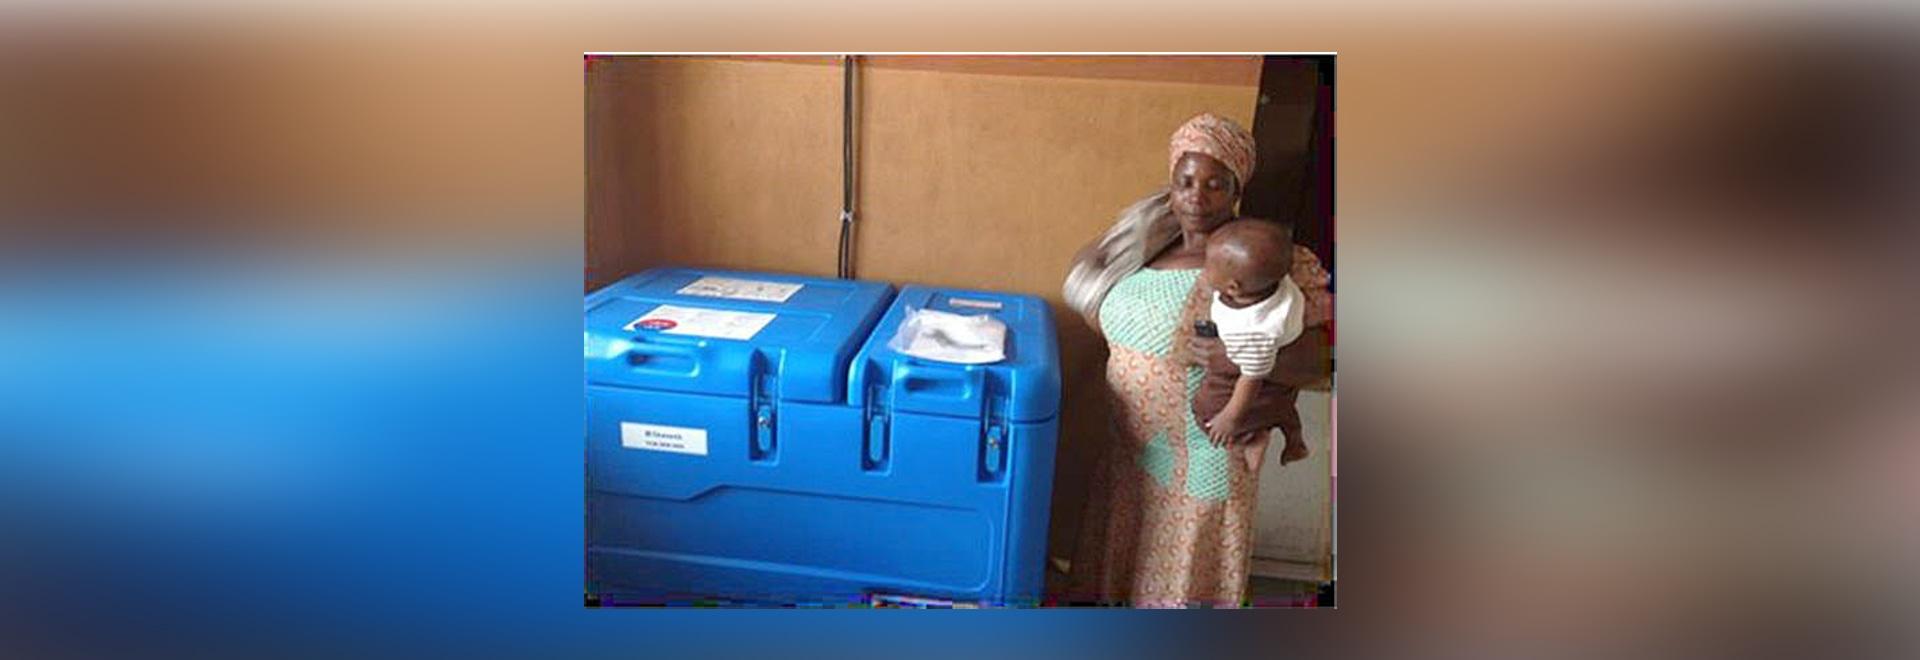 Solar Direct Drive vaccine refrigerators installed in Nigeria